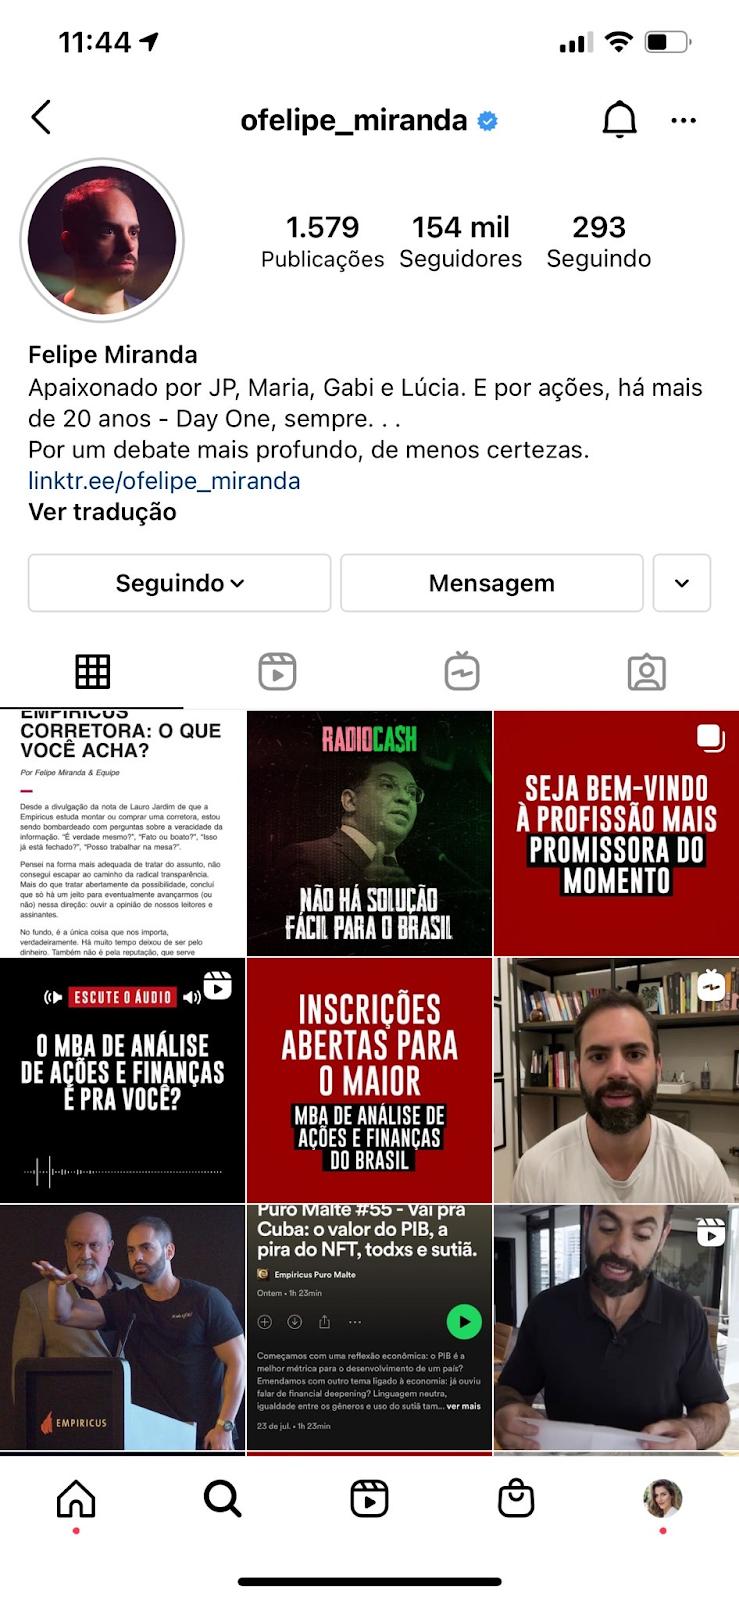 Perfil de Felipe Miranda no Instagram